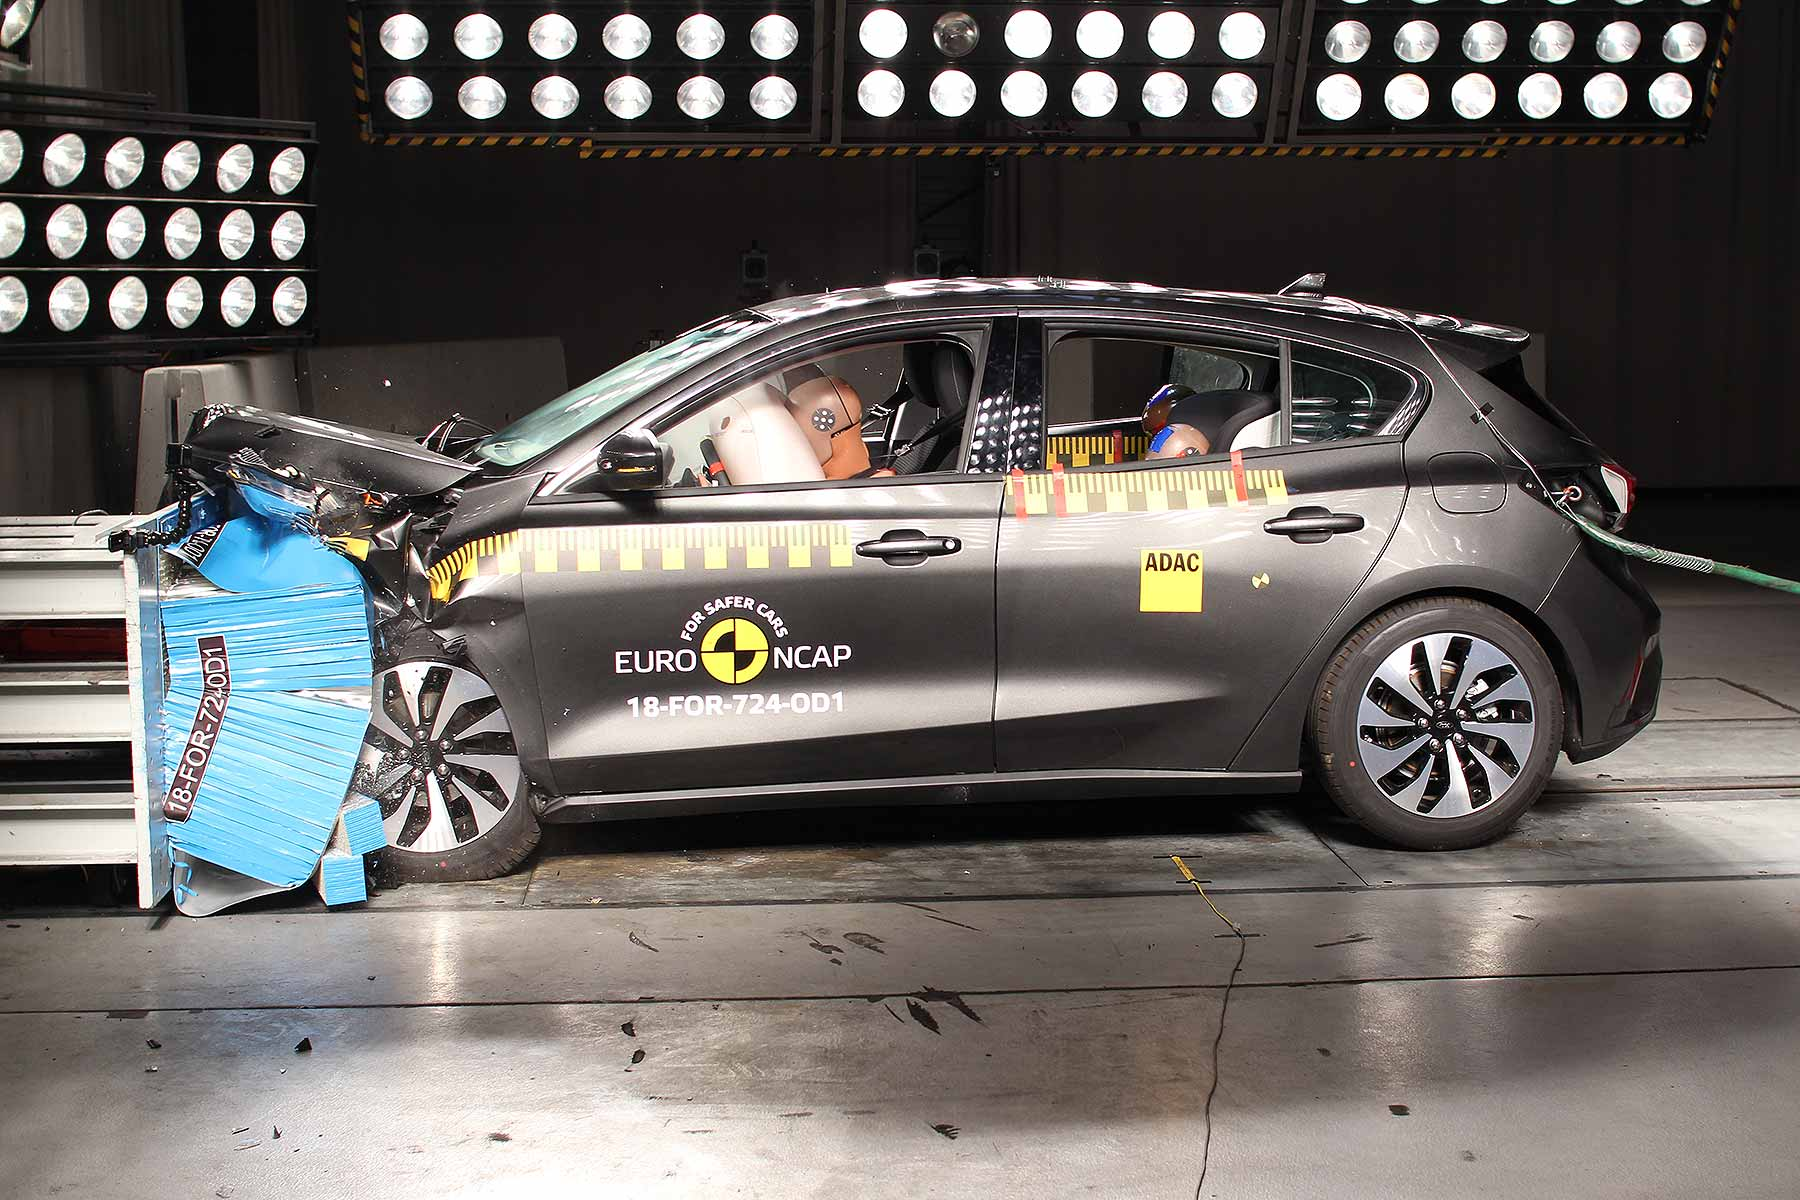 2018 Ford Focus Euro NCAP 5 stars